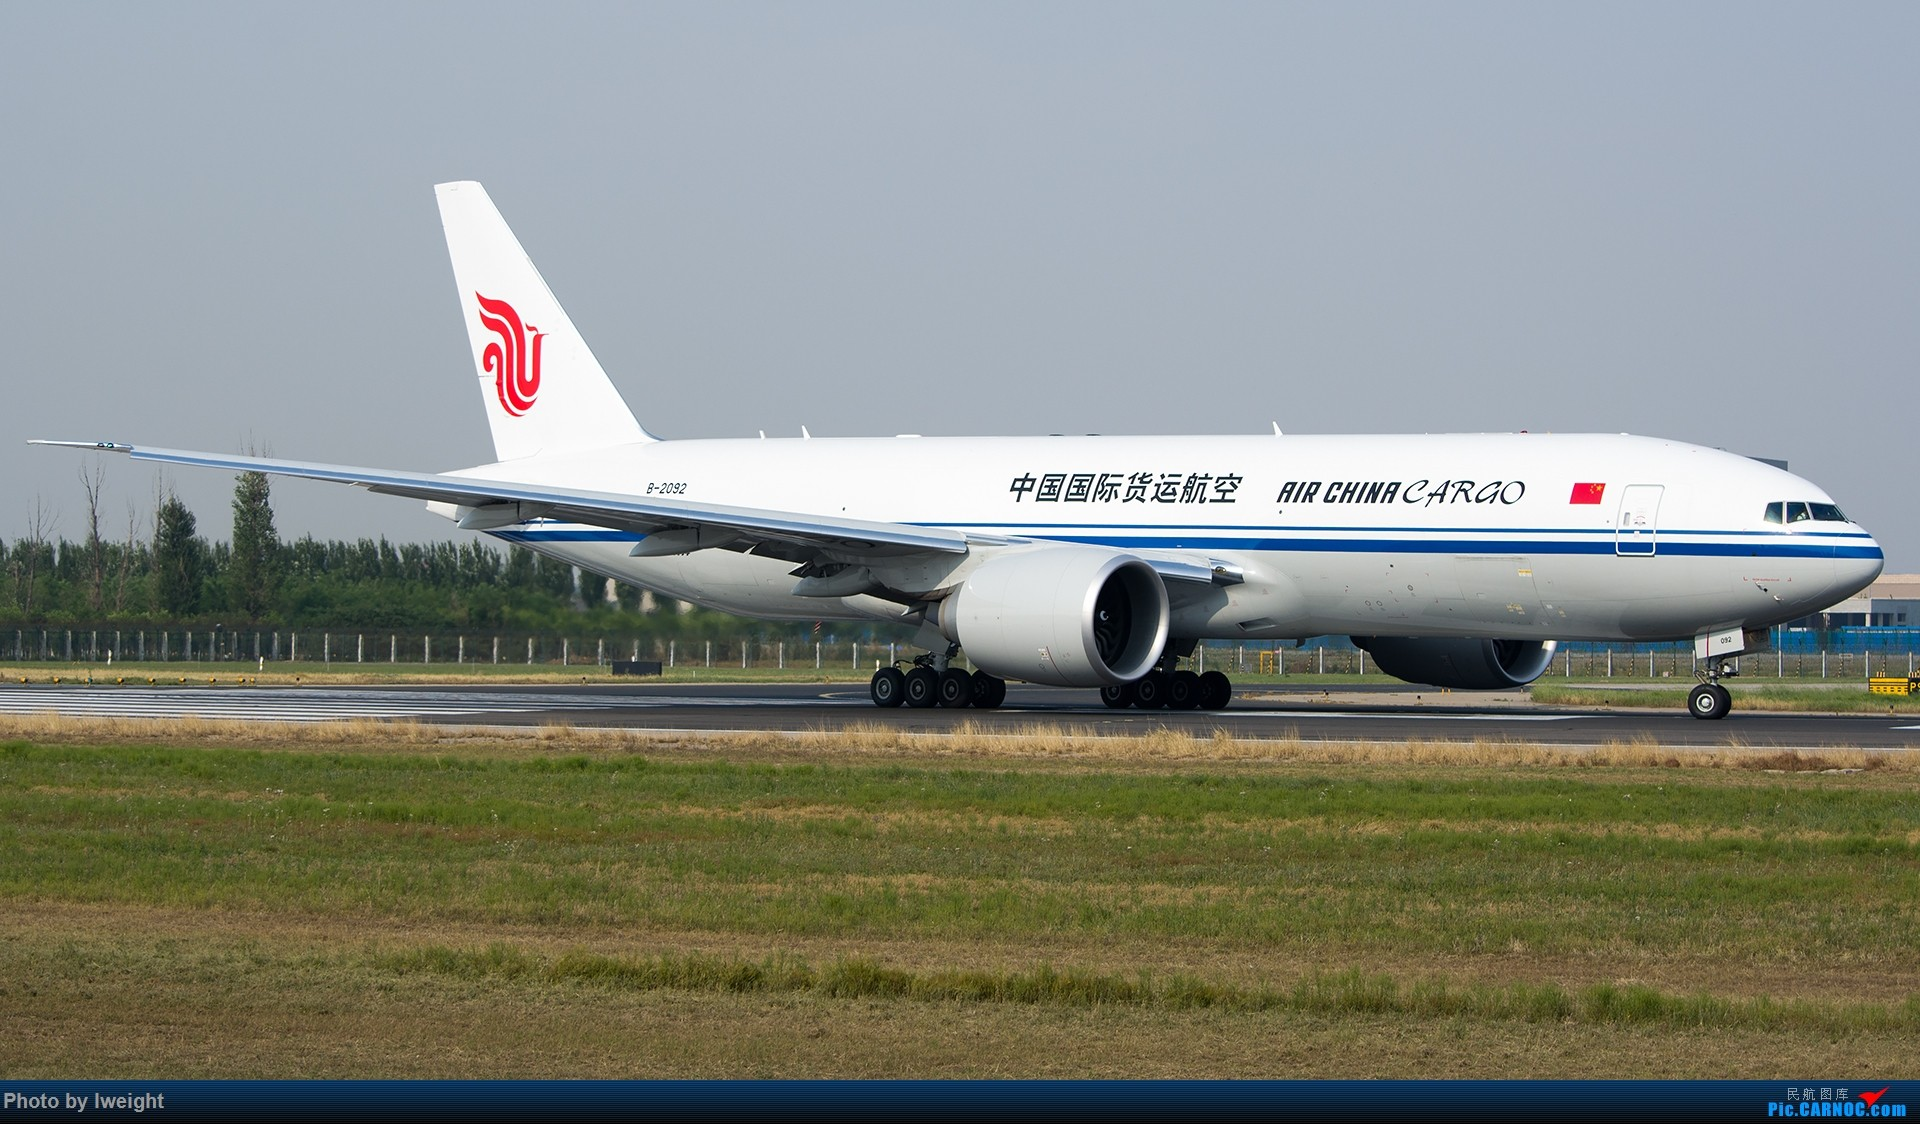 Re:[原创]周末帝都霾天拍机,凑合看看吧【2015-5-23】 BOEING 777-200 B-2092 中国北京首都国际机场